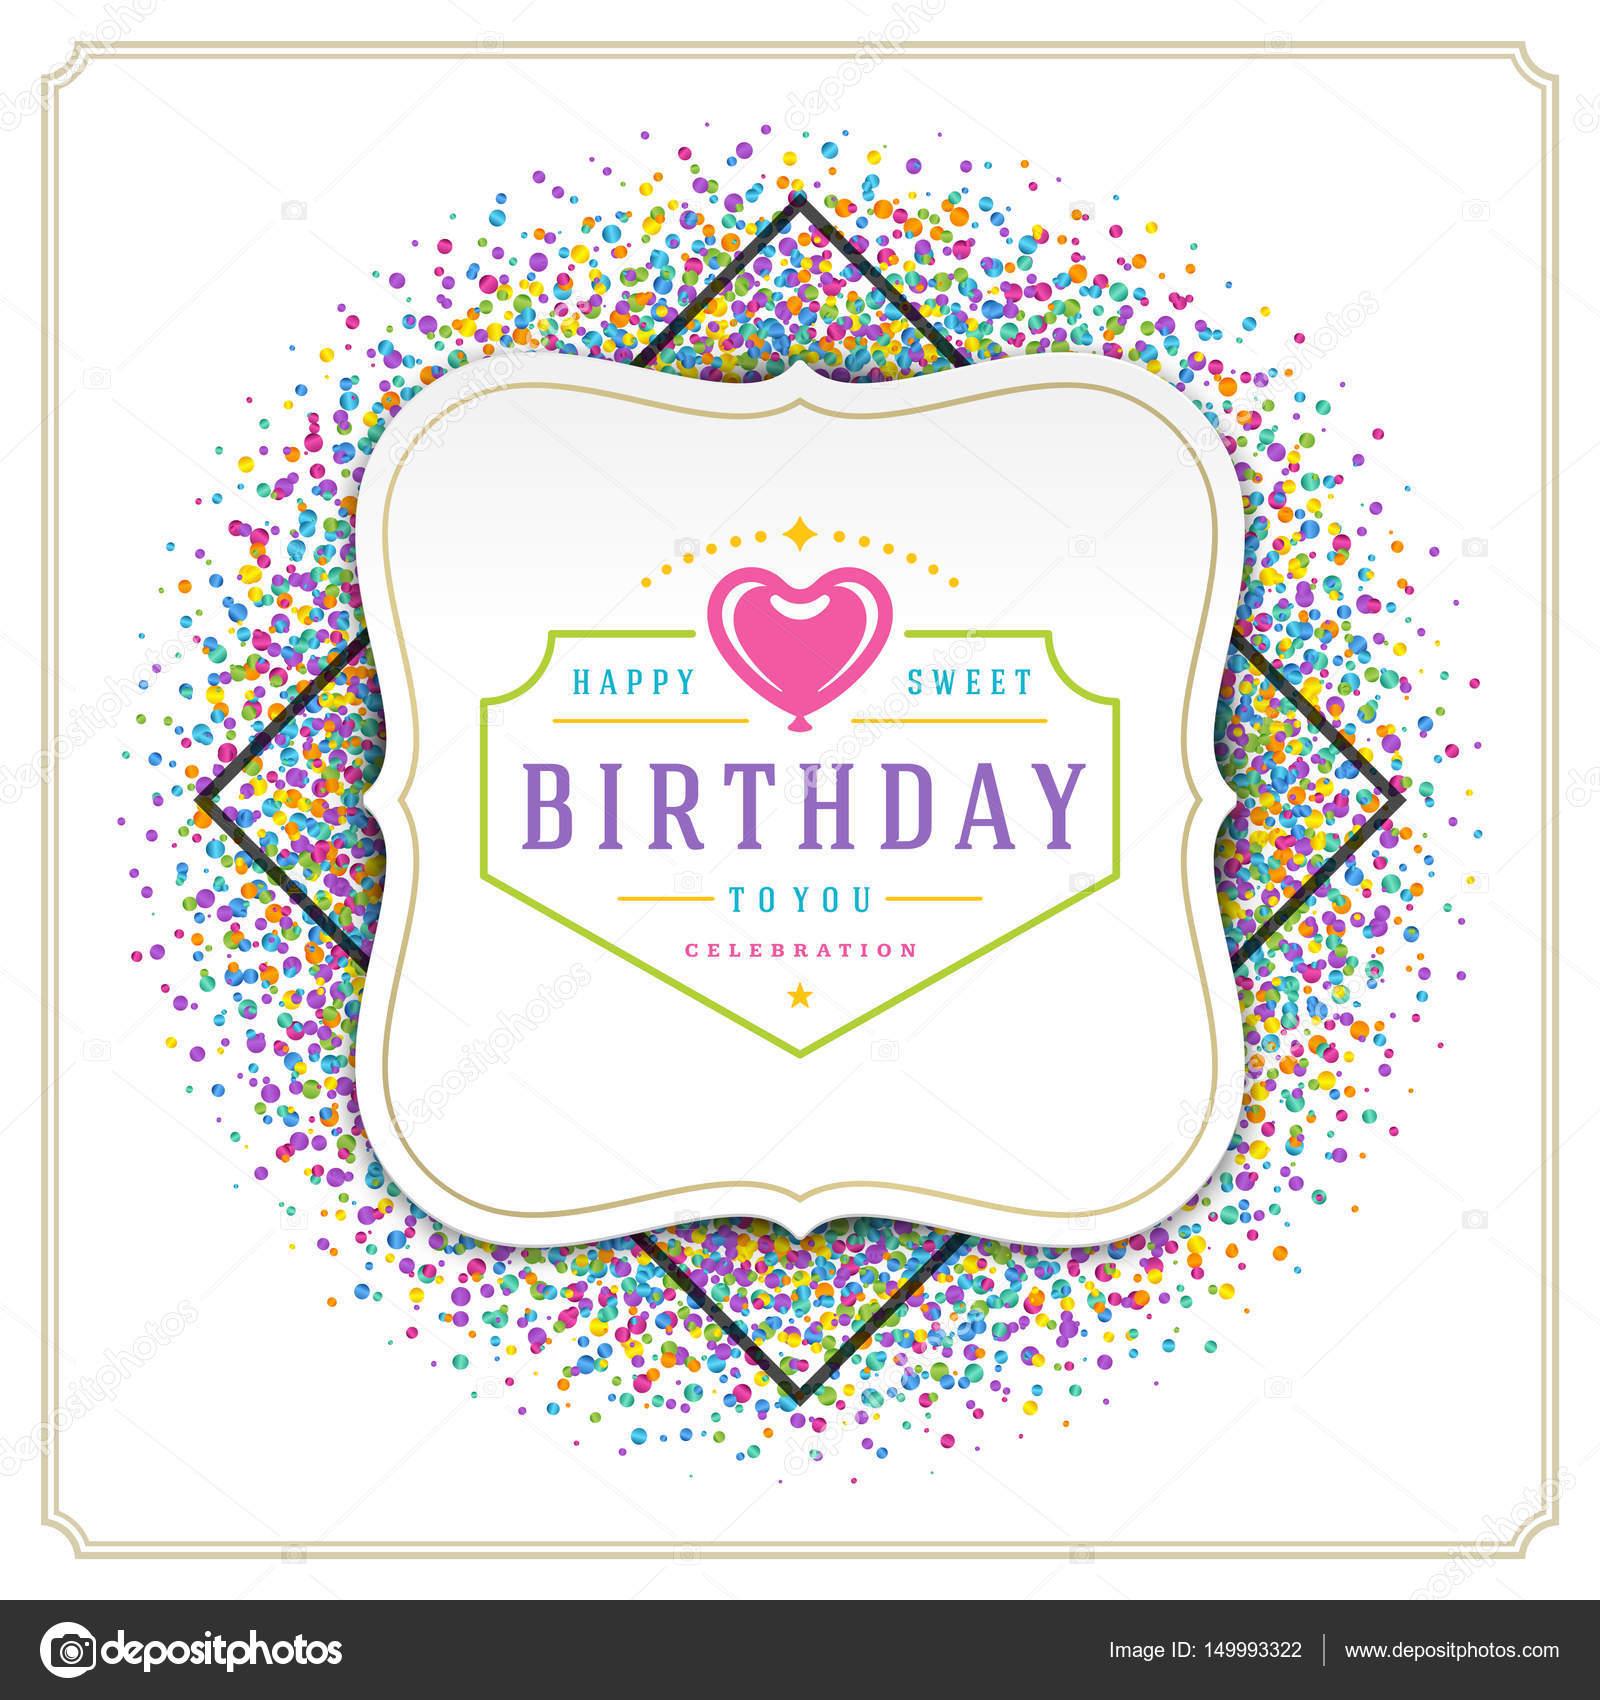 Happy Birthday Greeting Card Design Vektor Vorlage Stockillustration